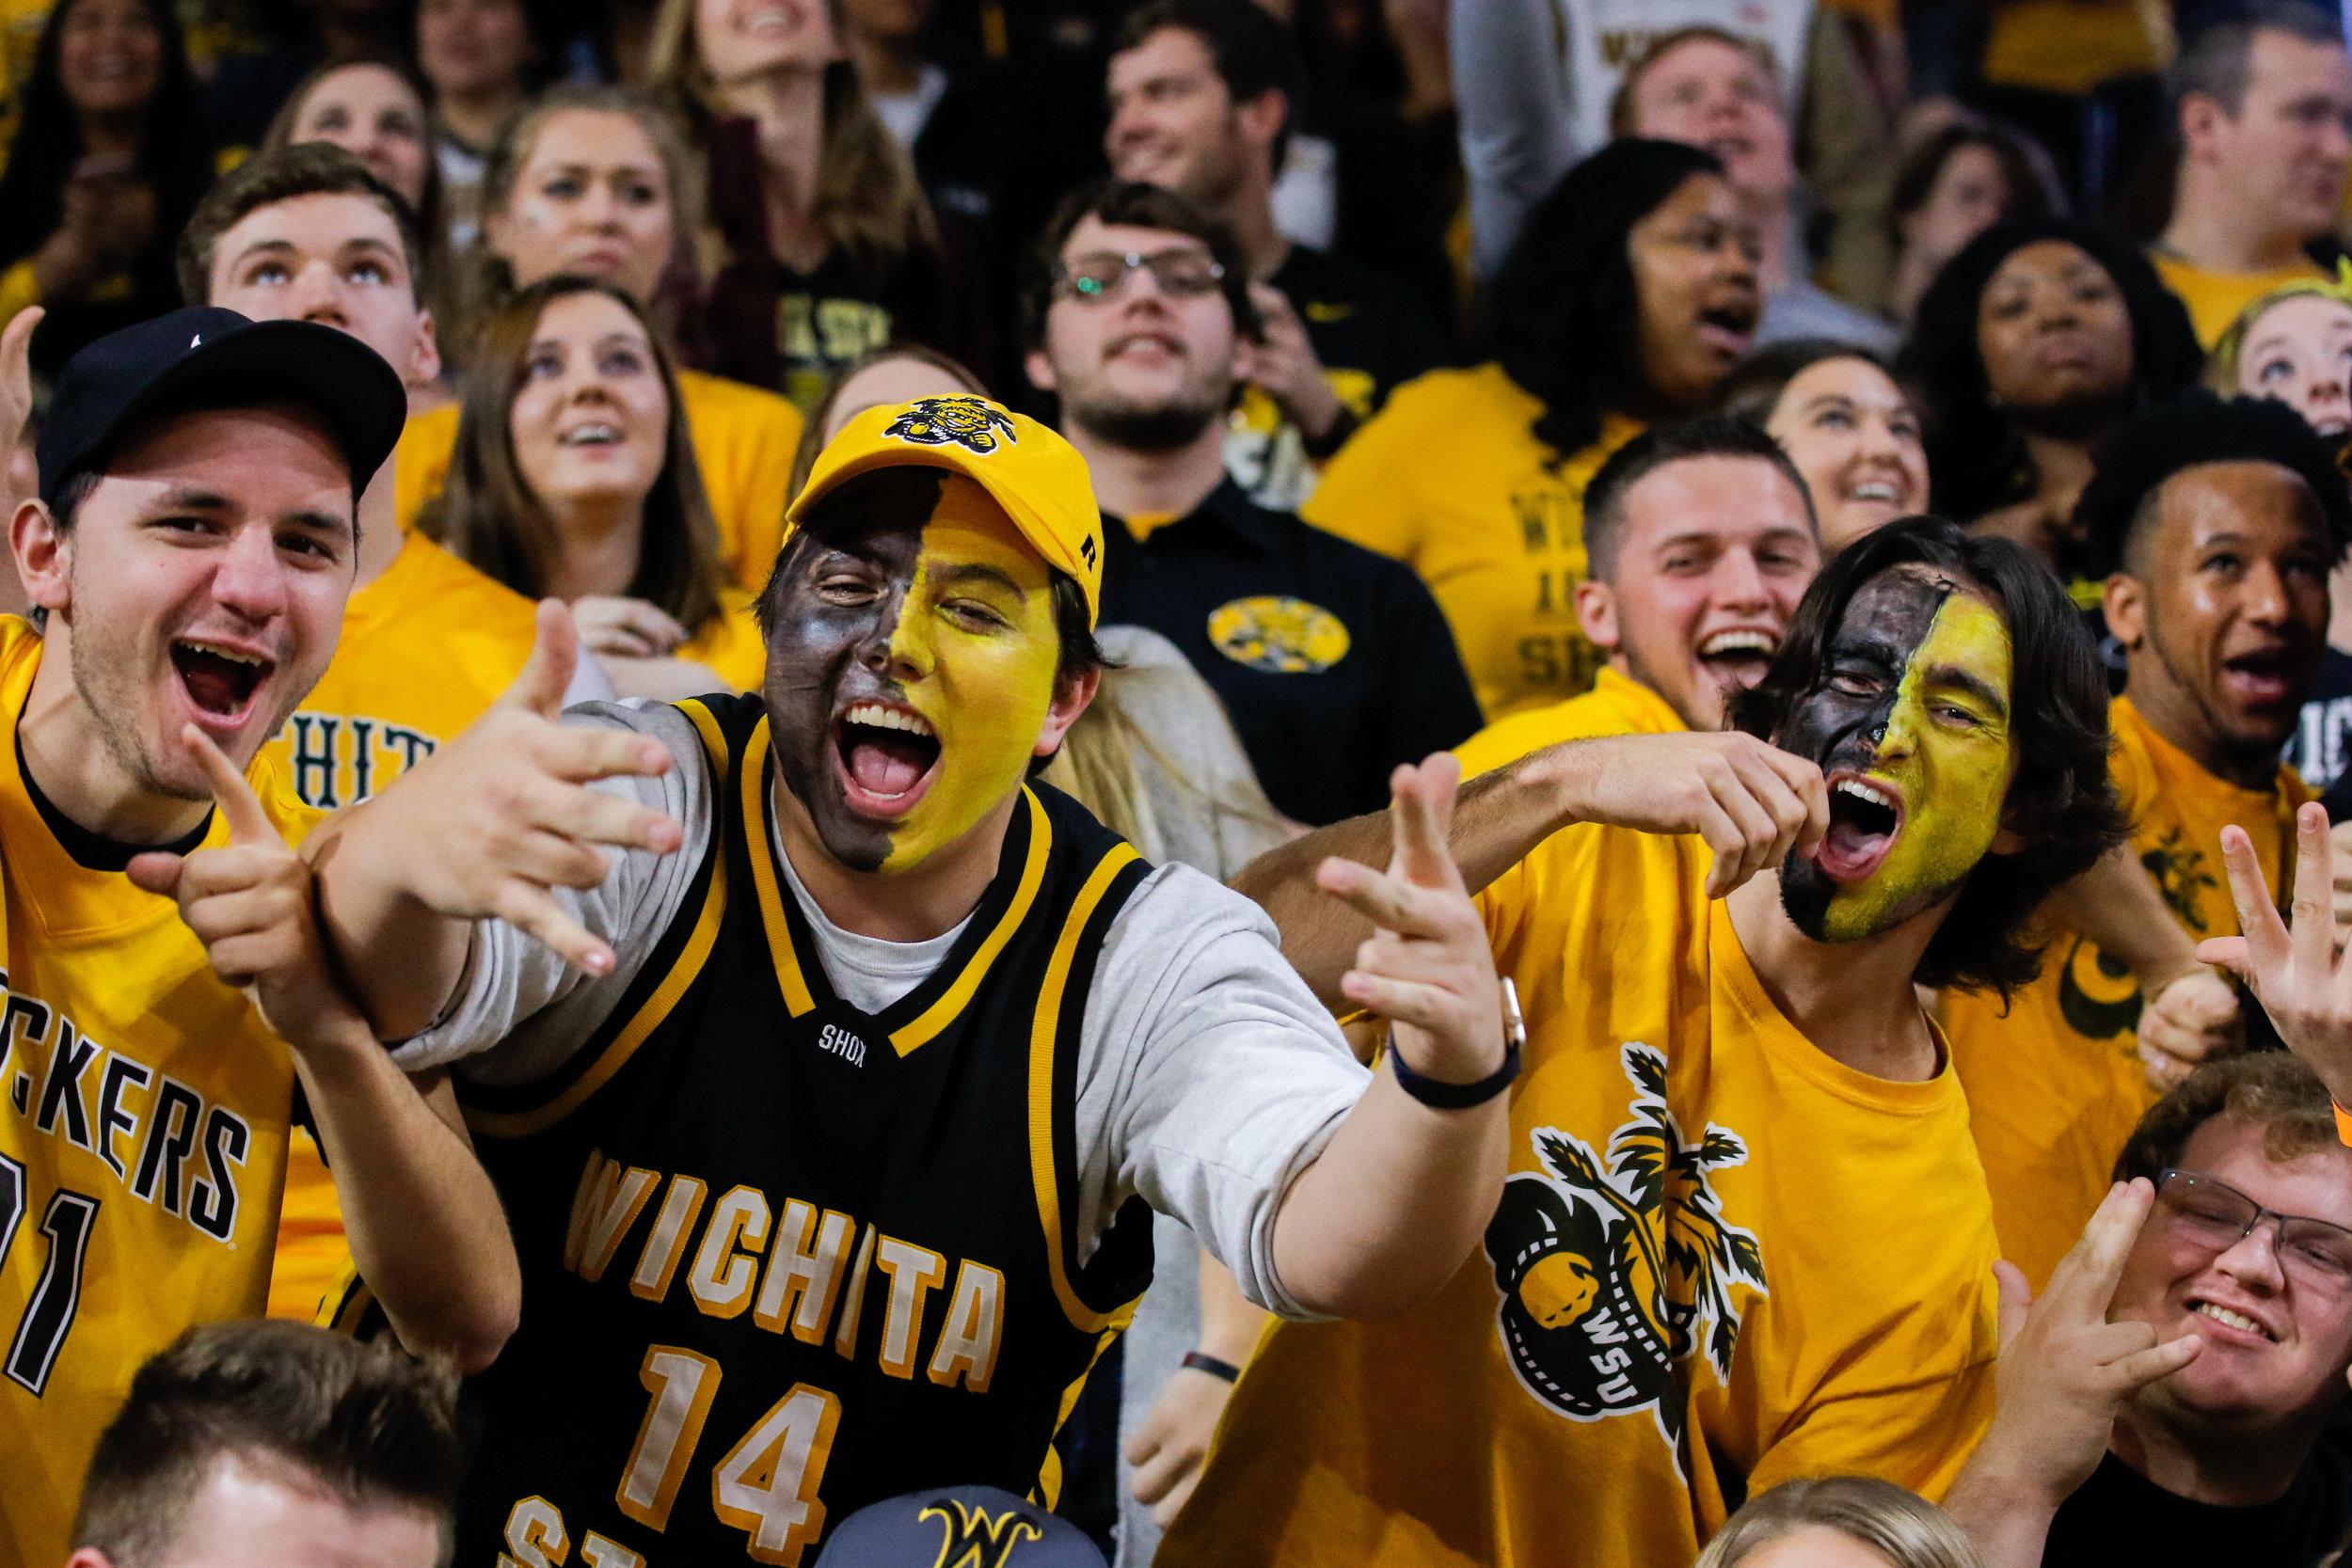 Wichita State fans celebrate during their game on November 7, 2017 against UMKC in Wichita, KS.